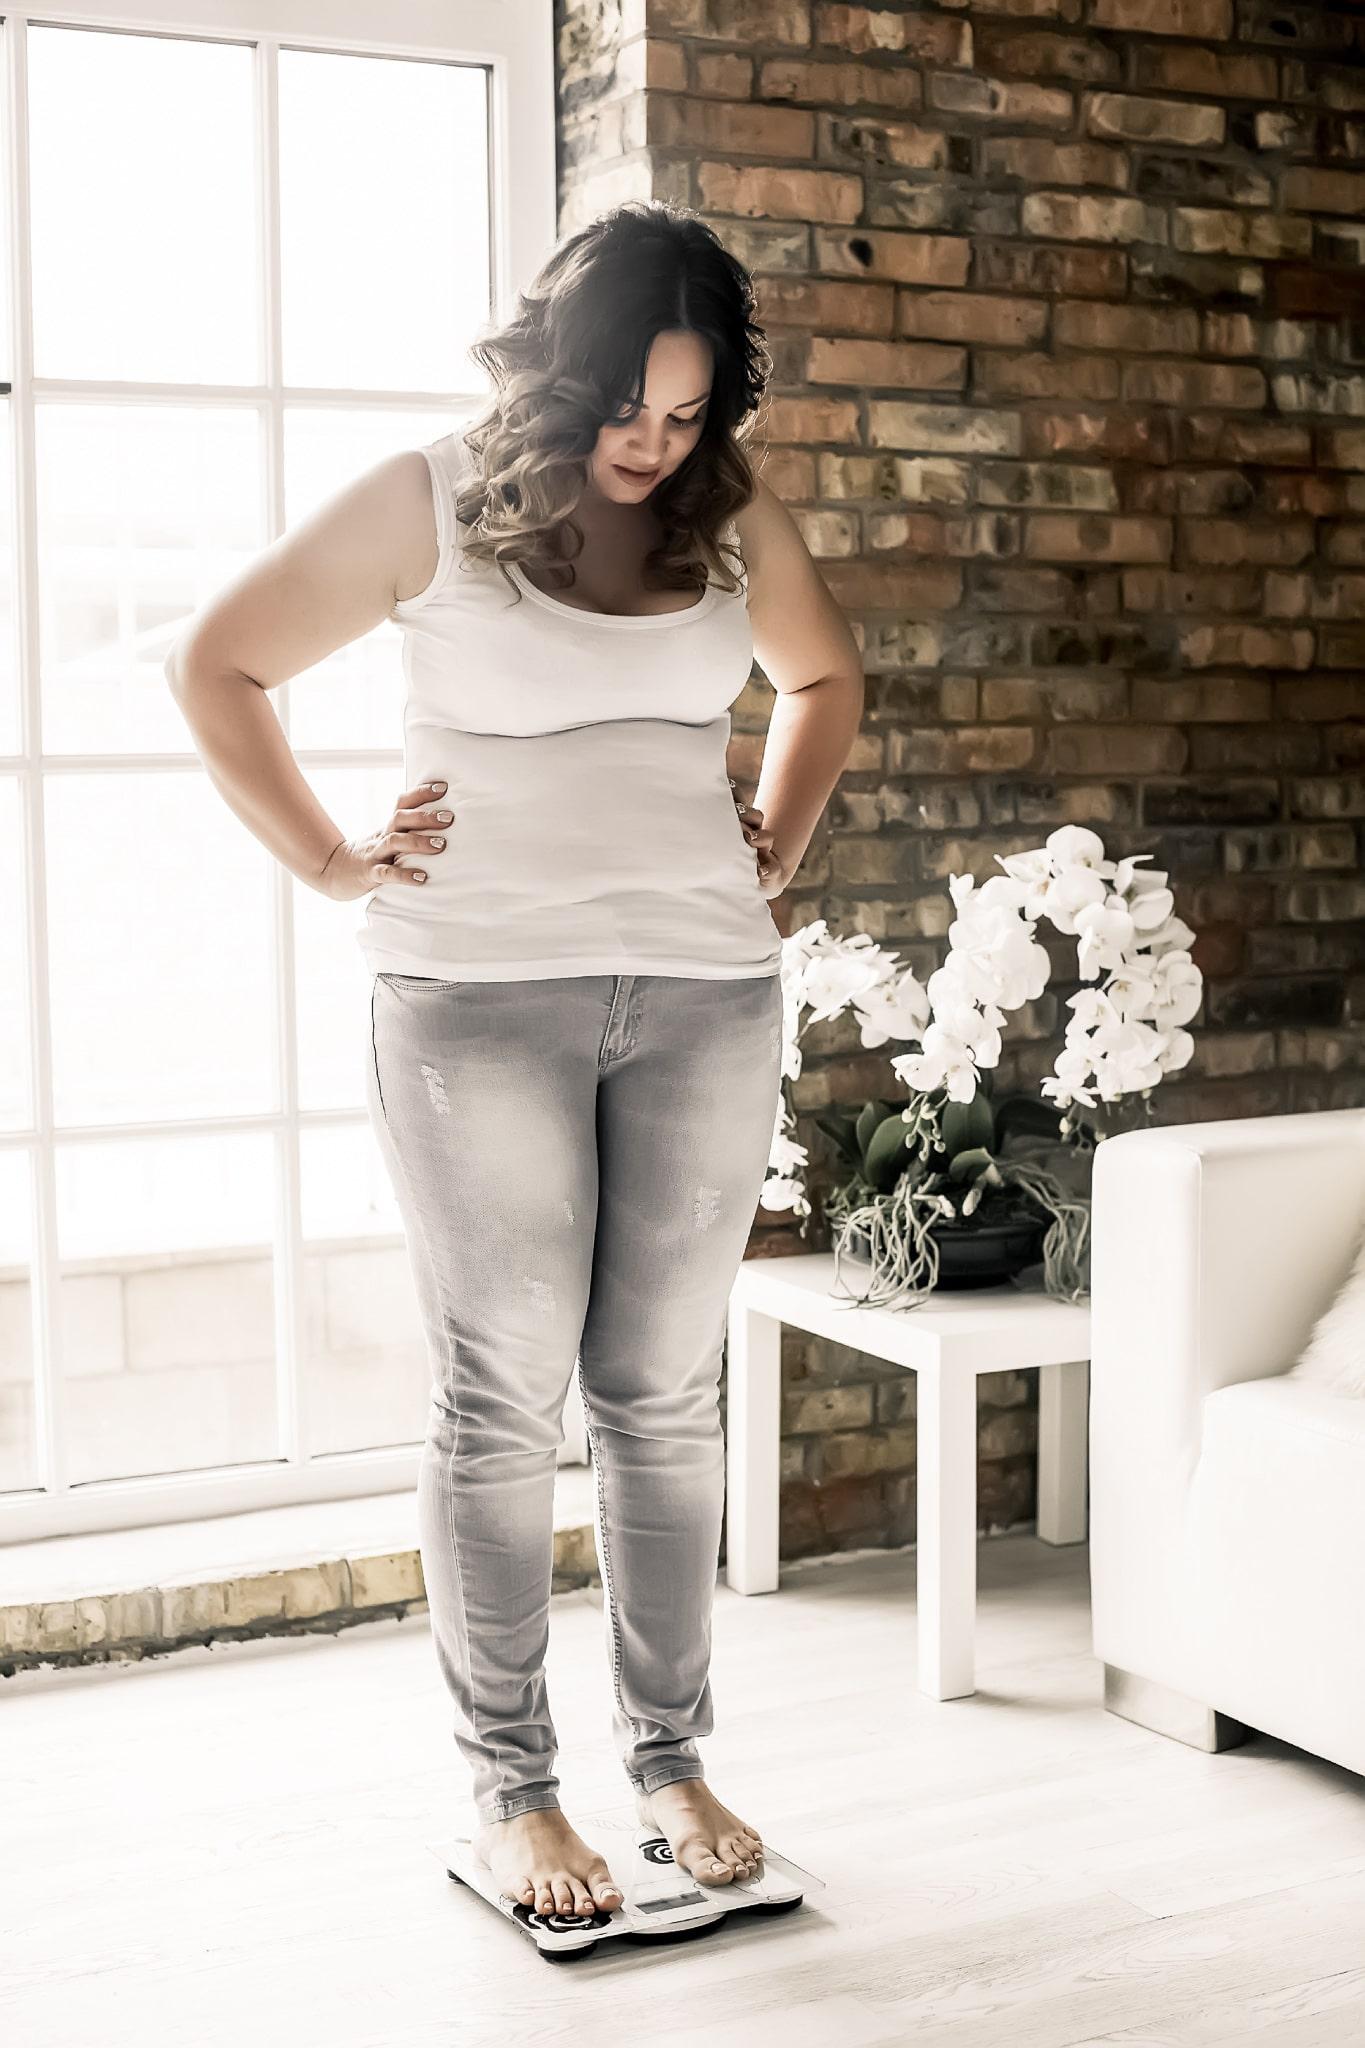 hypothyroidism weight gain stomach